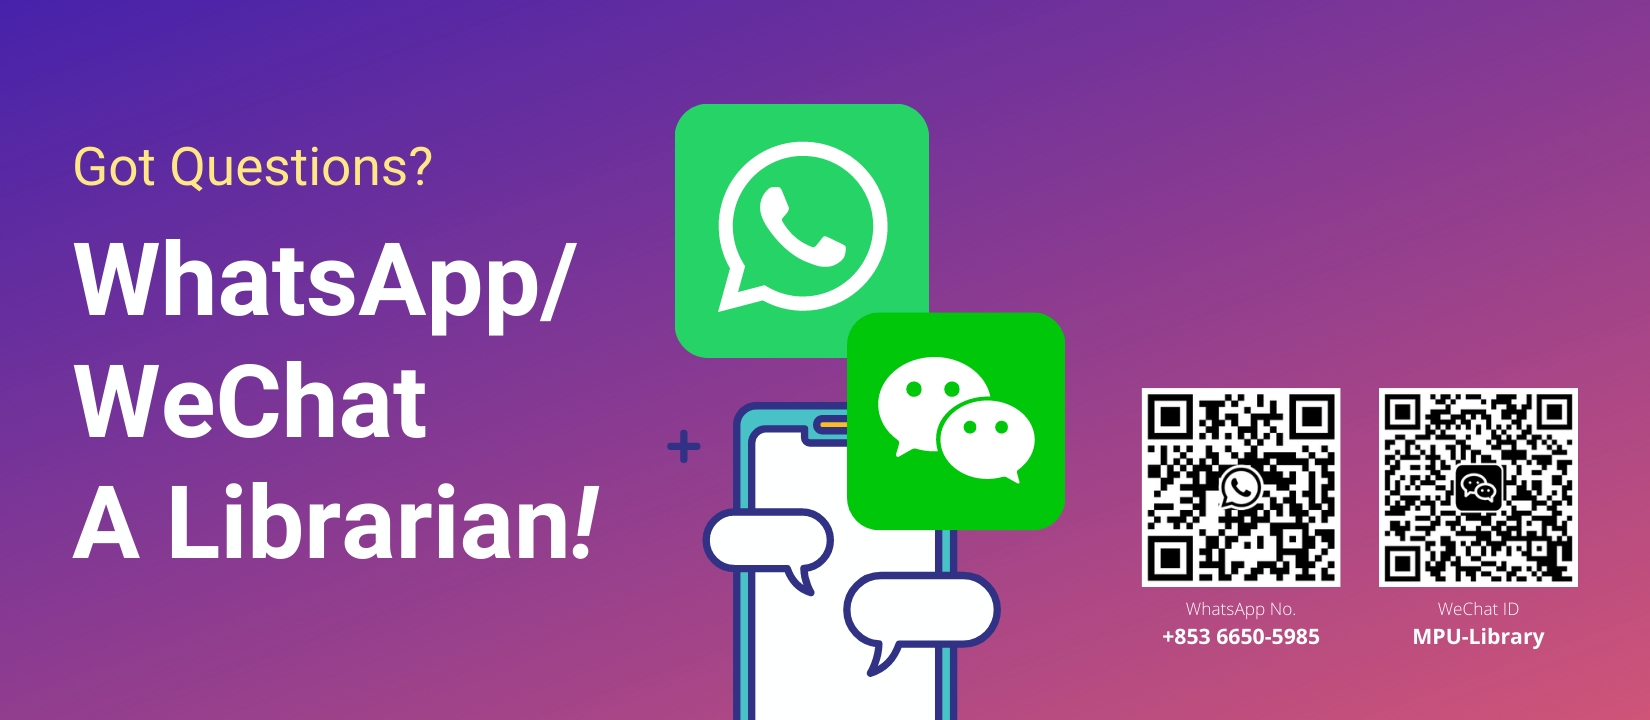 WhatsApp / WeChat a Librarian